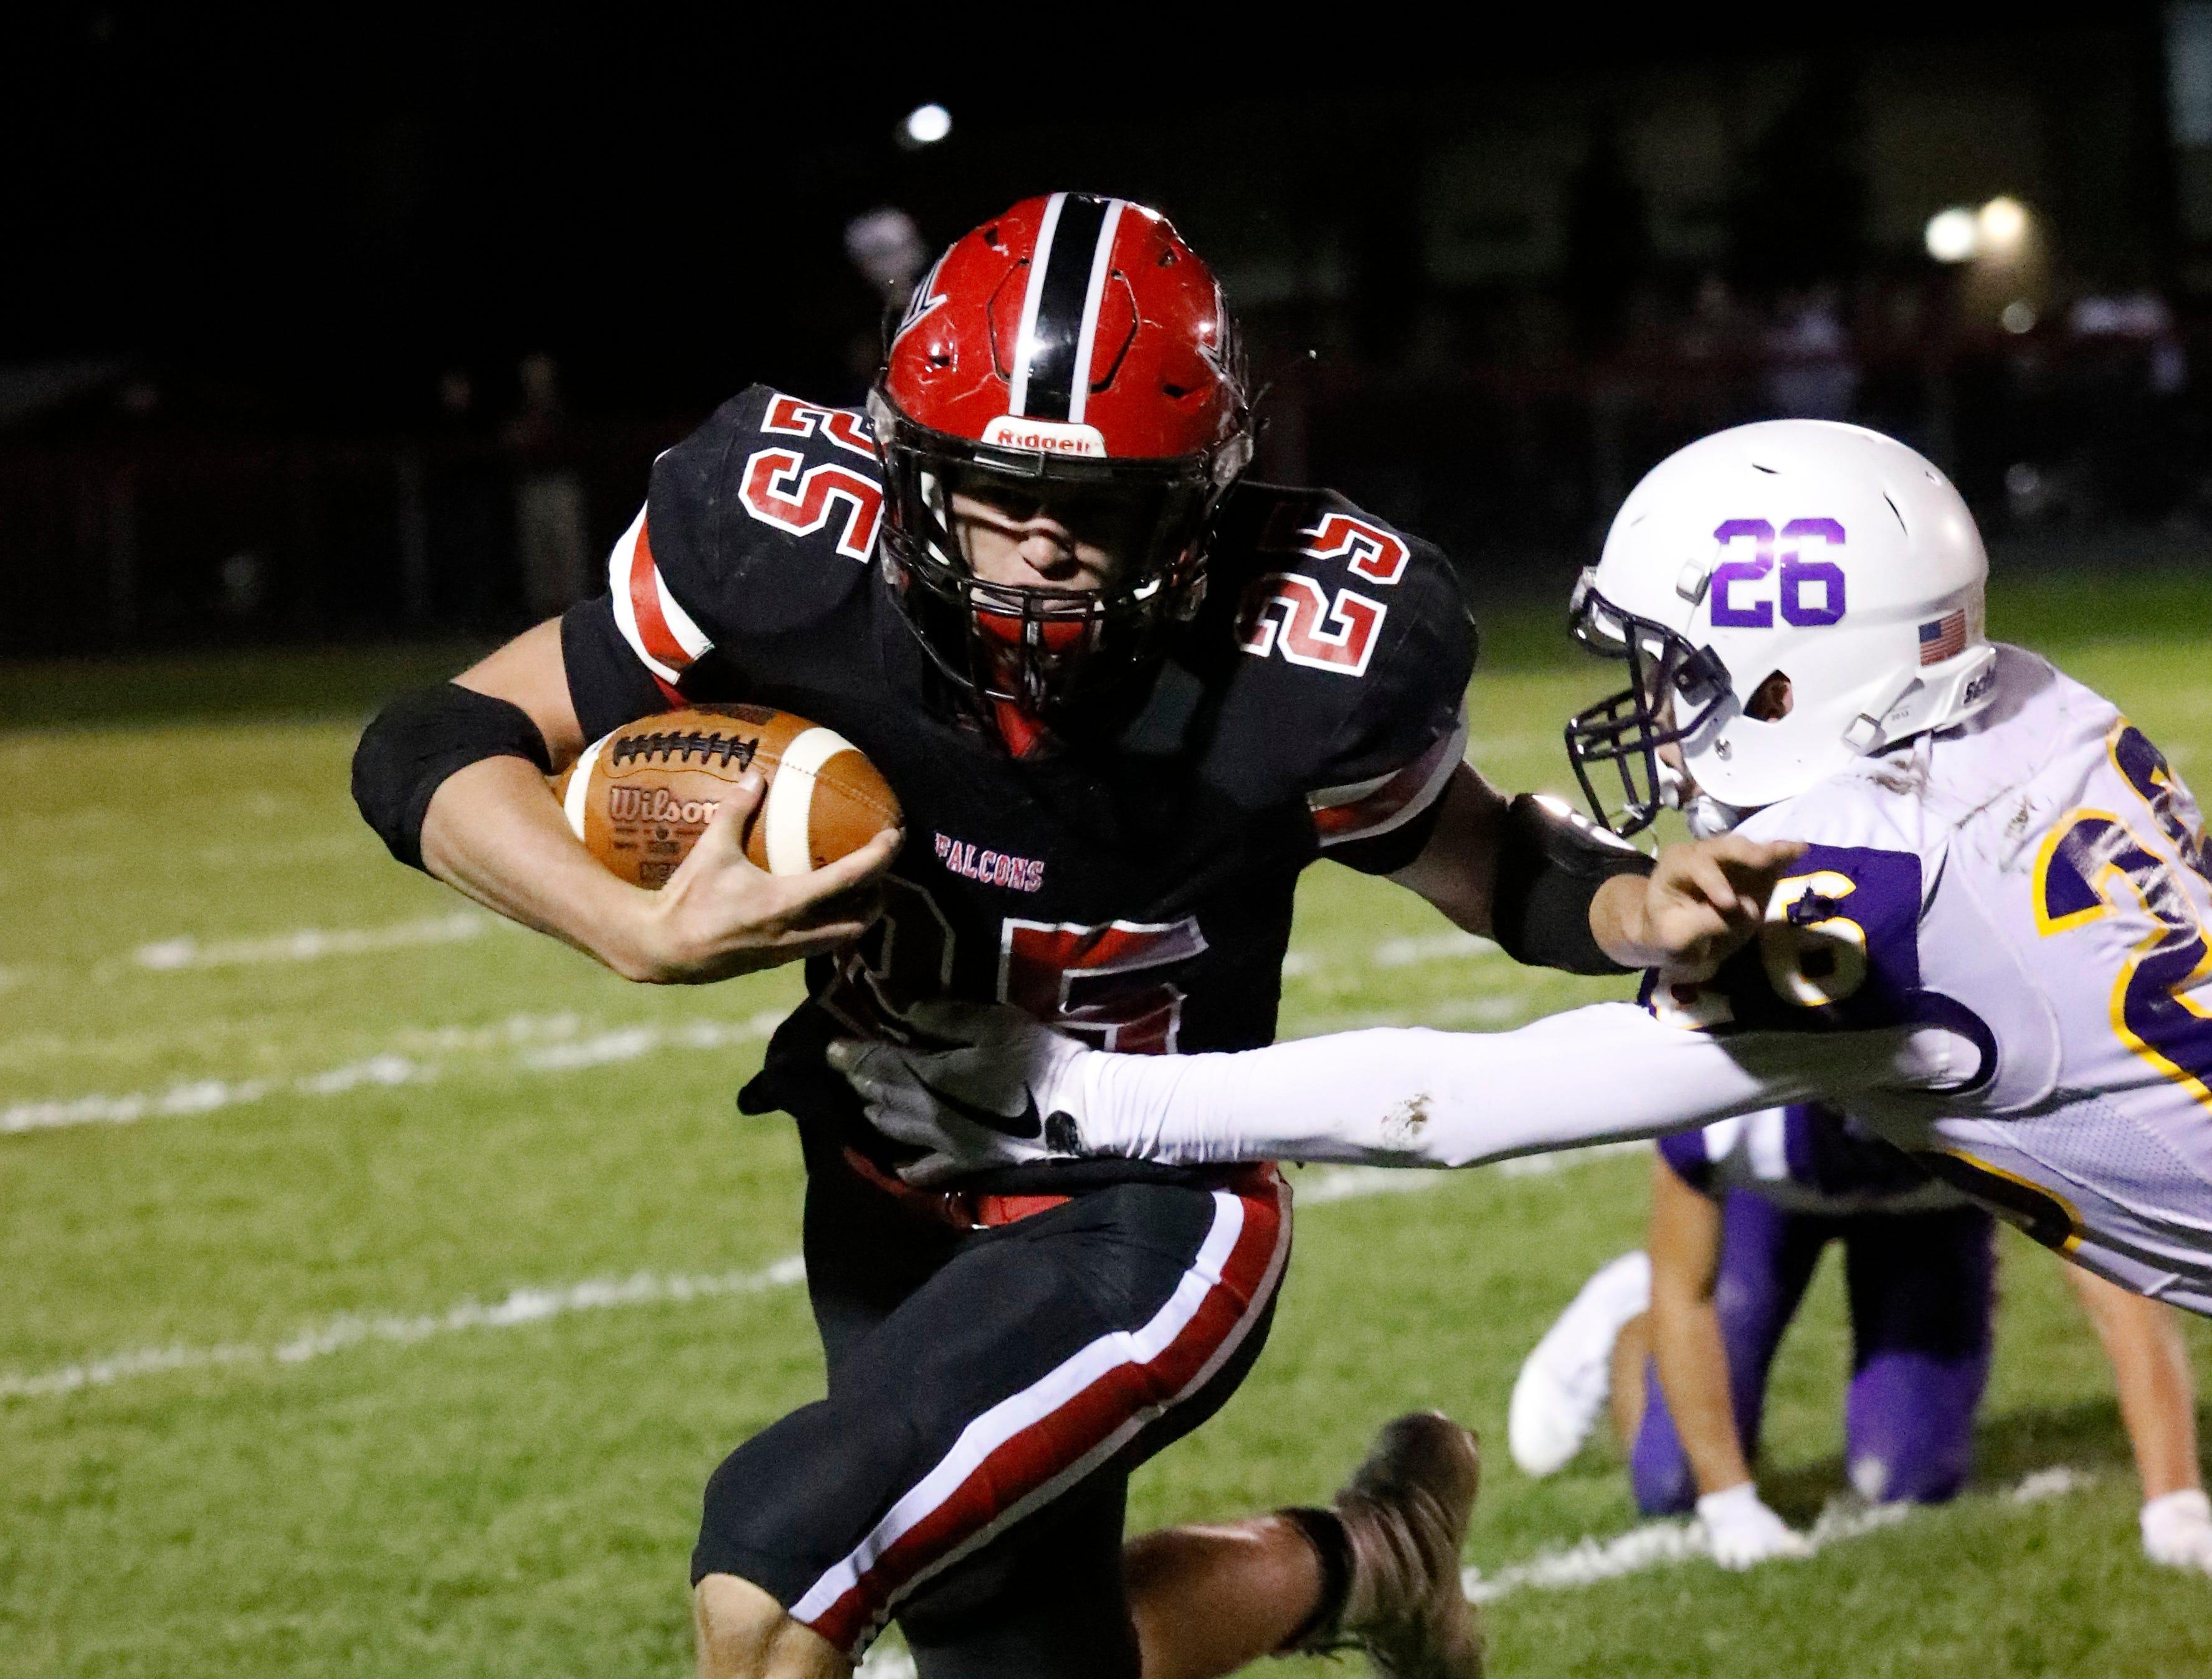 Bloom-Carroll defeated Fairfield Union 44-7 Friday night, Oct. 19, 2018, at Fairfield Union High School in Rushville.